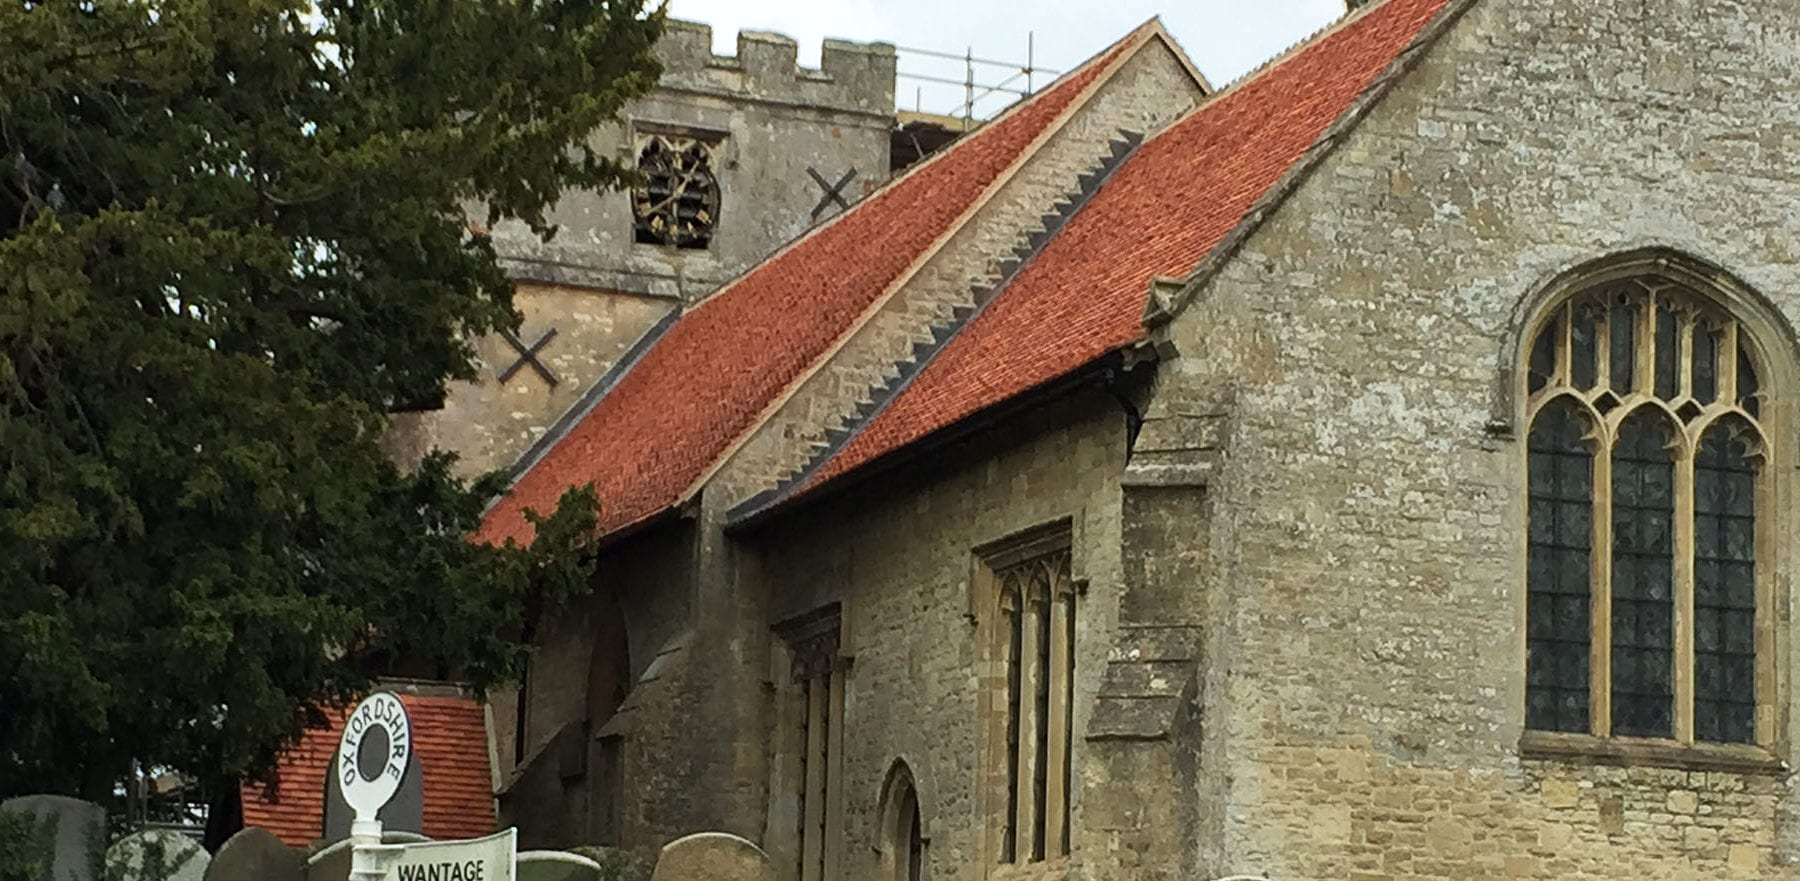 Lifestiles - Handcrafted Orange Clay Roof Tiles - Letcombe, England 2